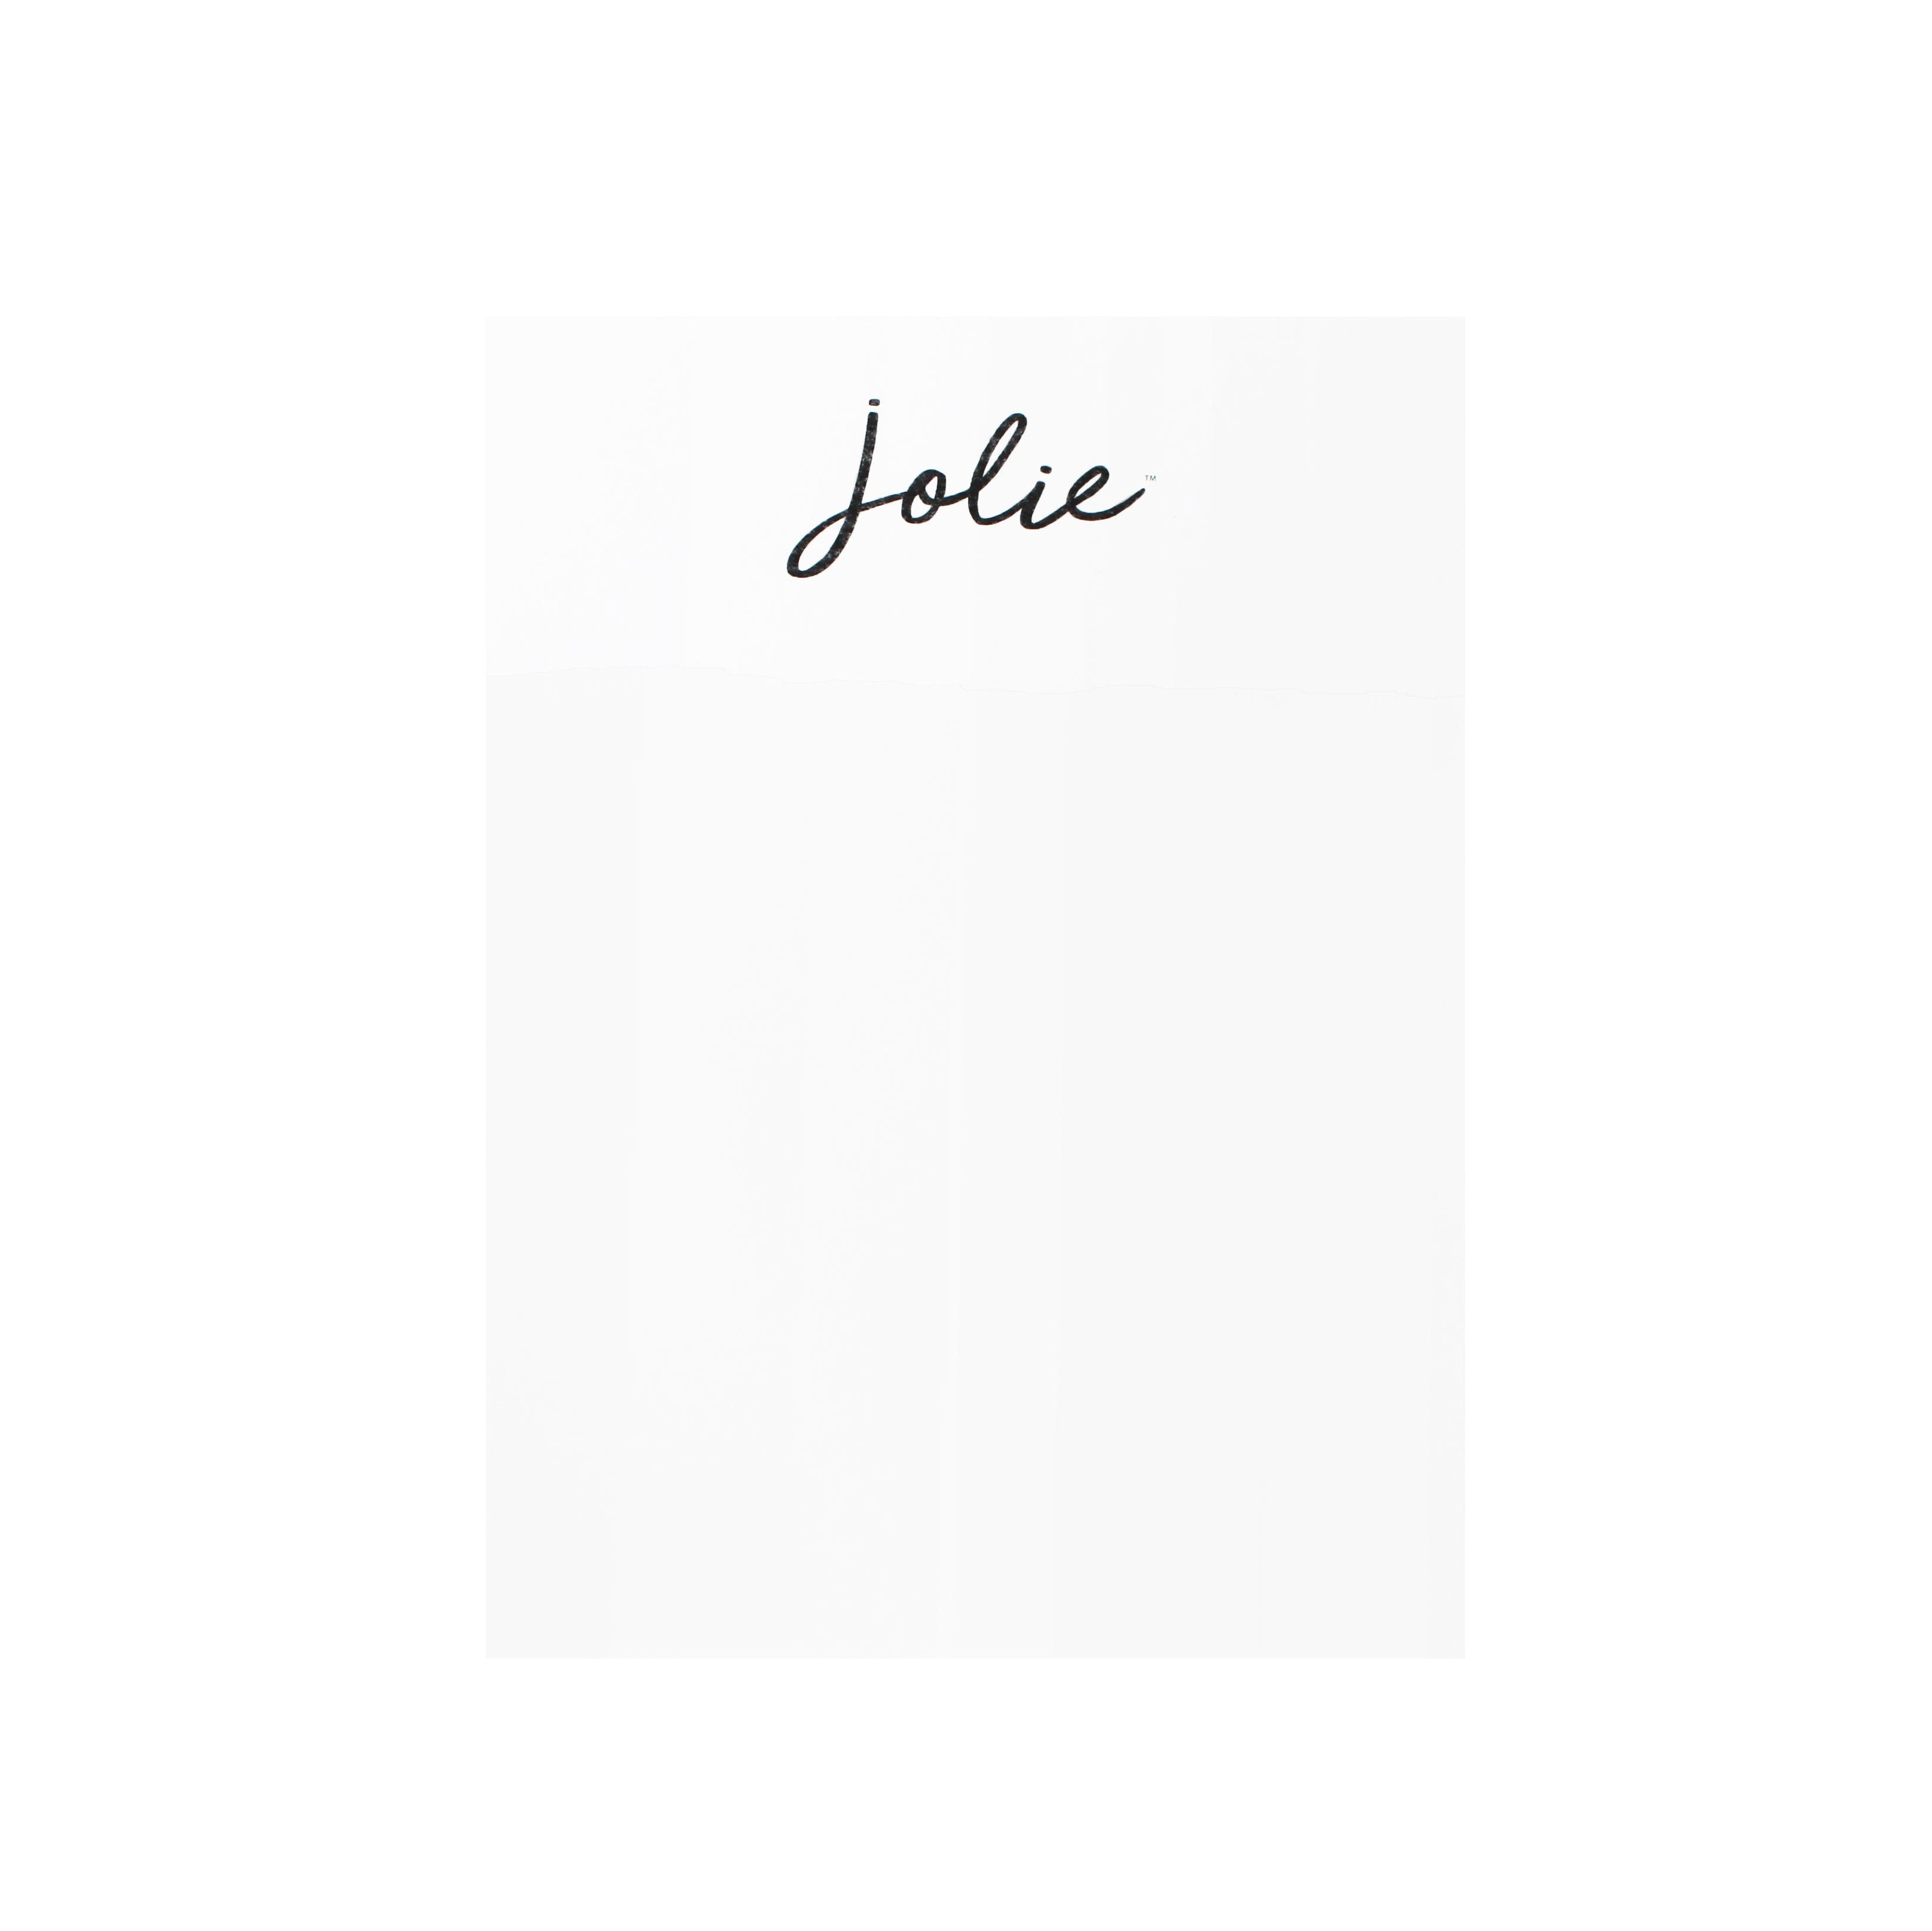 Palace White- Jolie Paint